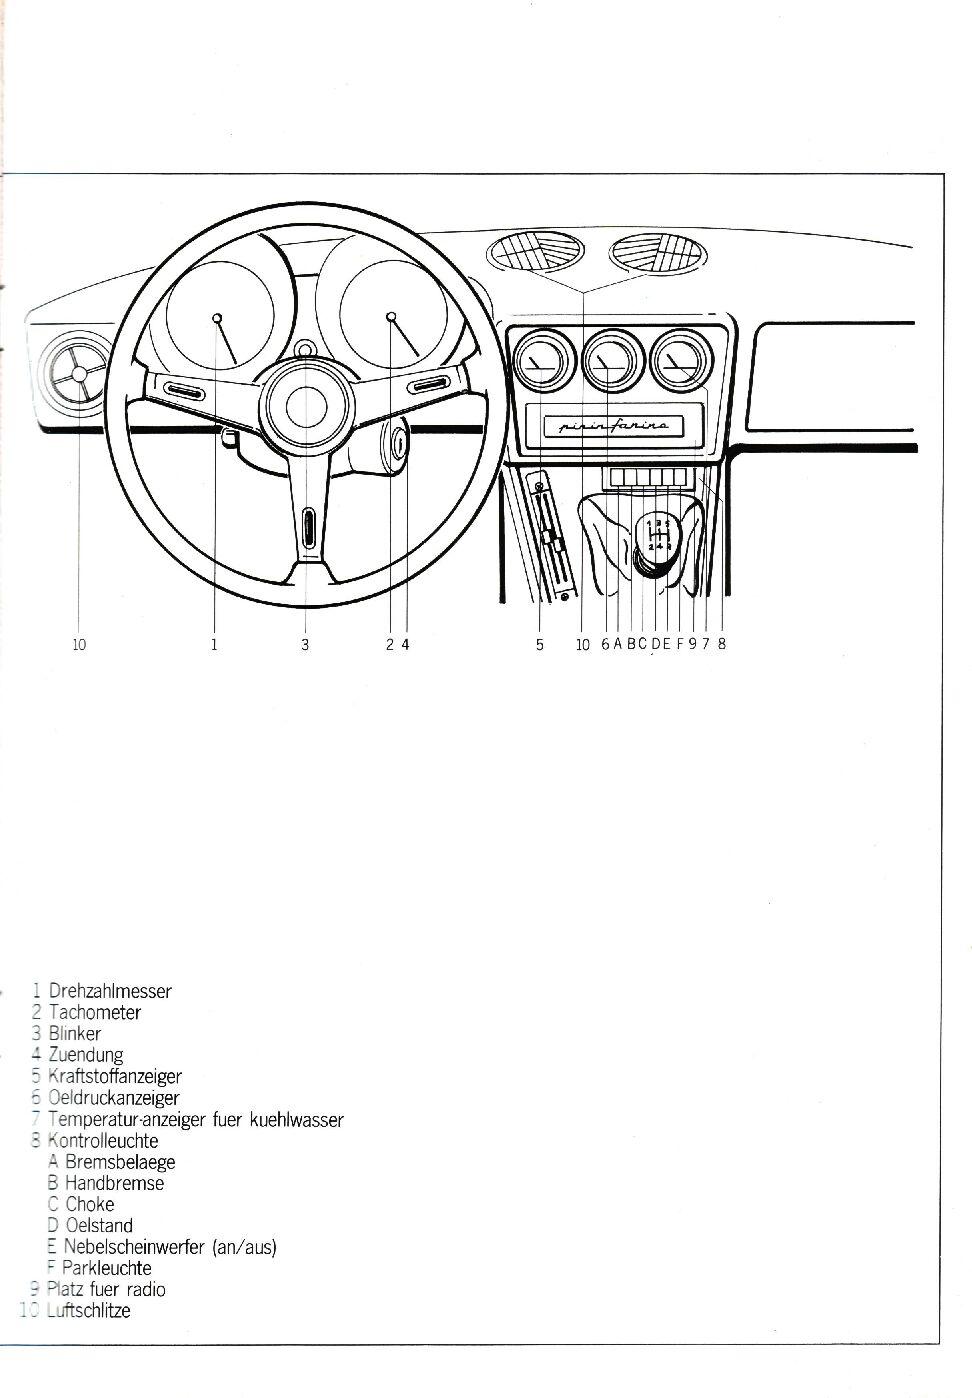 1983 Alfa Romeo Spider brochure